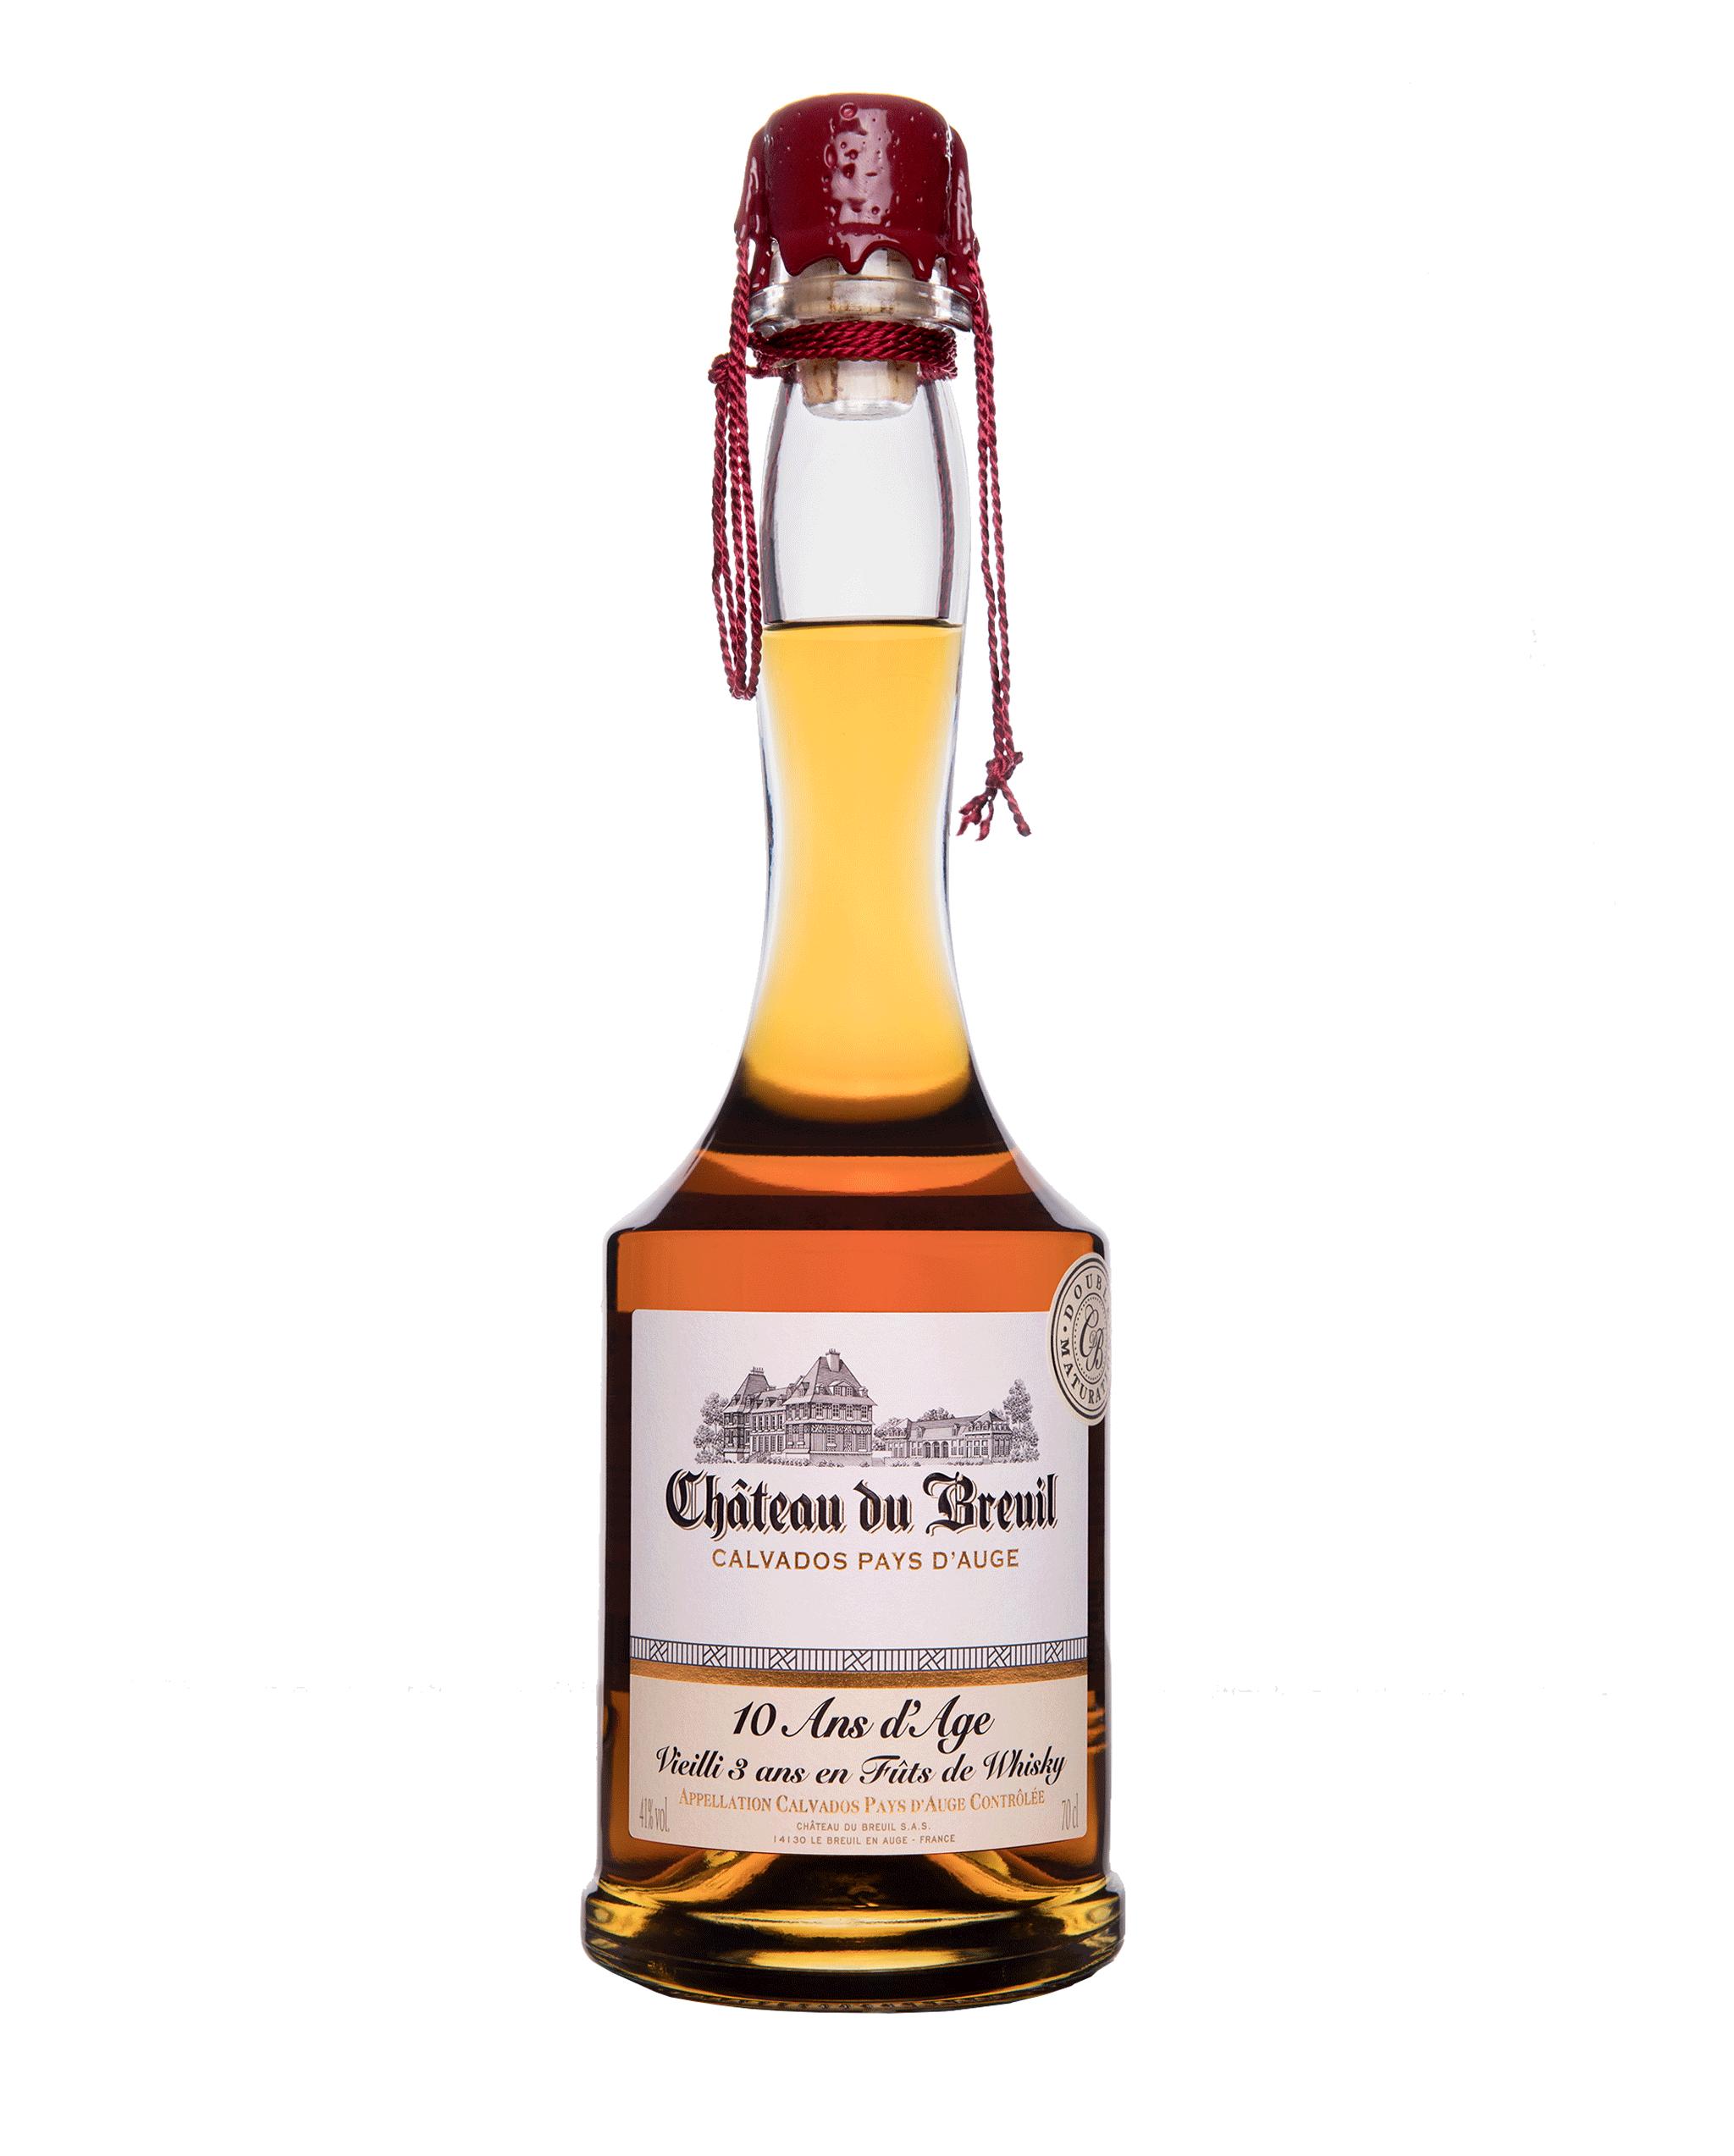 Bouteille Calvados finition fûts de whisky